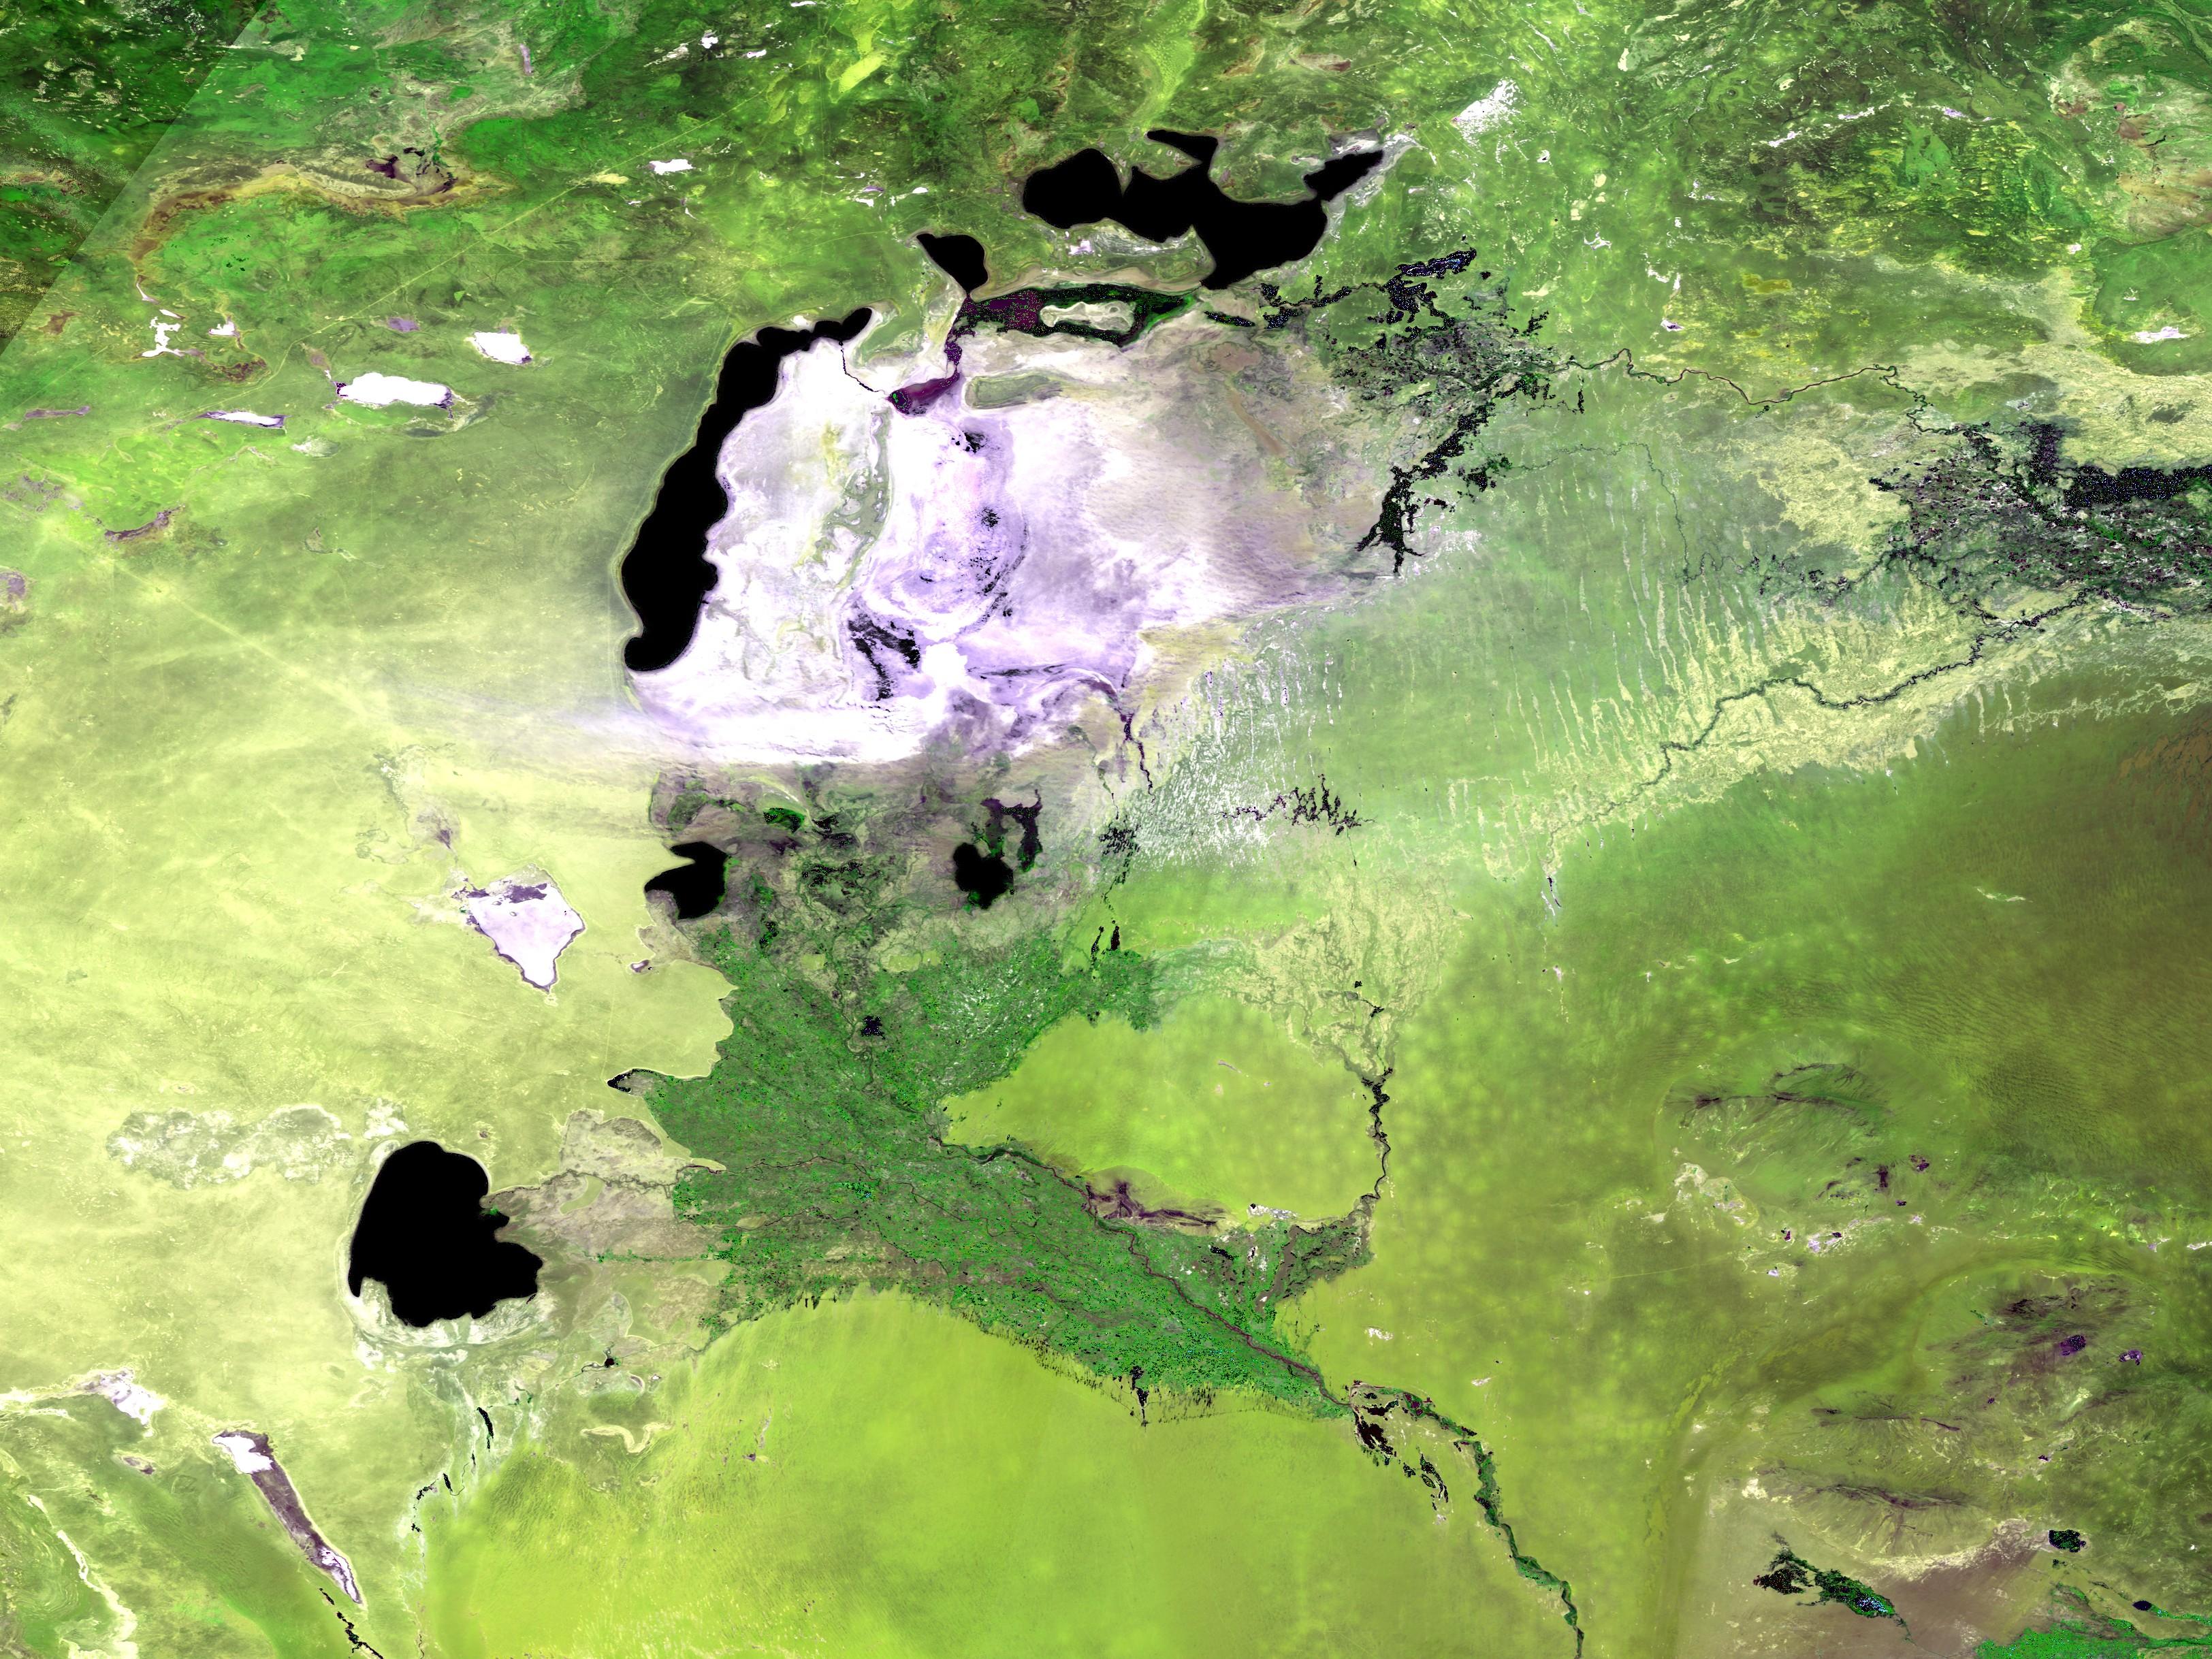 http://www.esa.int/var/esa/storage/images/esa_multimedia/images/2014/05/aral_sea/14555465-1-eng-GB/Aral_Sea.jpg